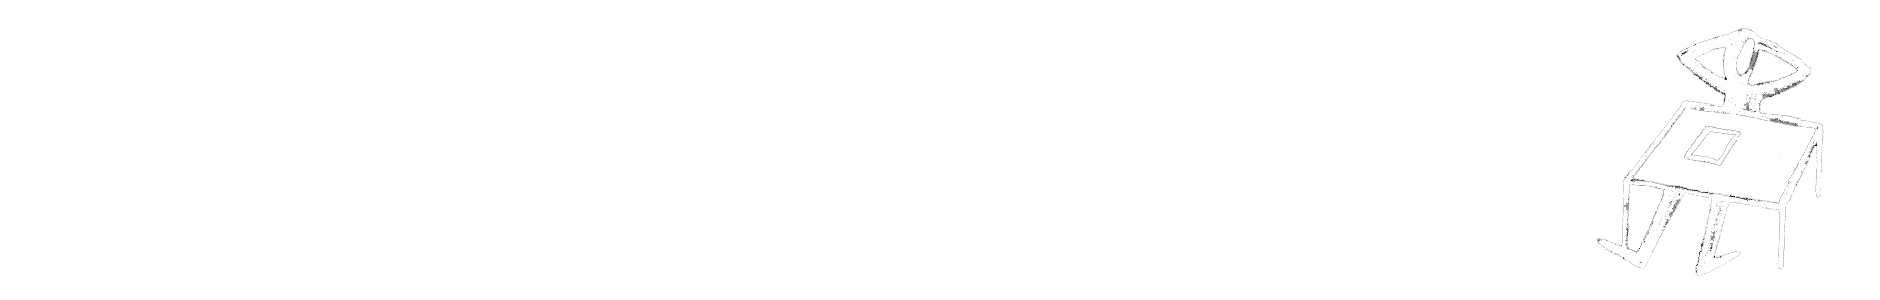 Halduskultuur | The Estonian Journal of Administrative Culture and Digital Governance